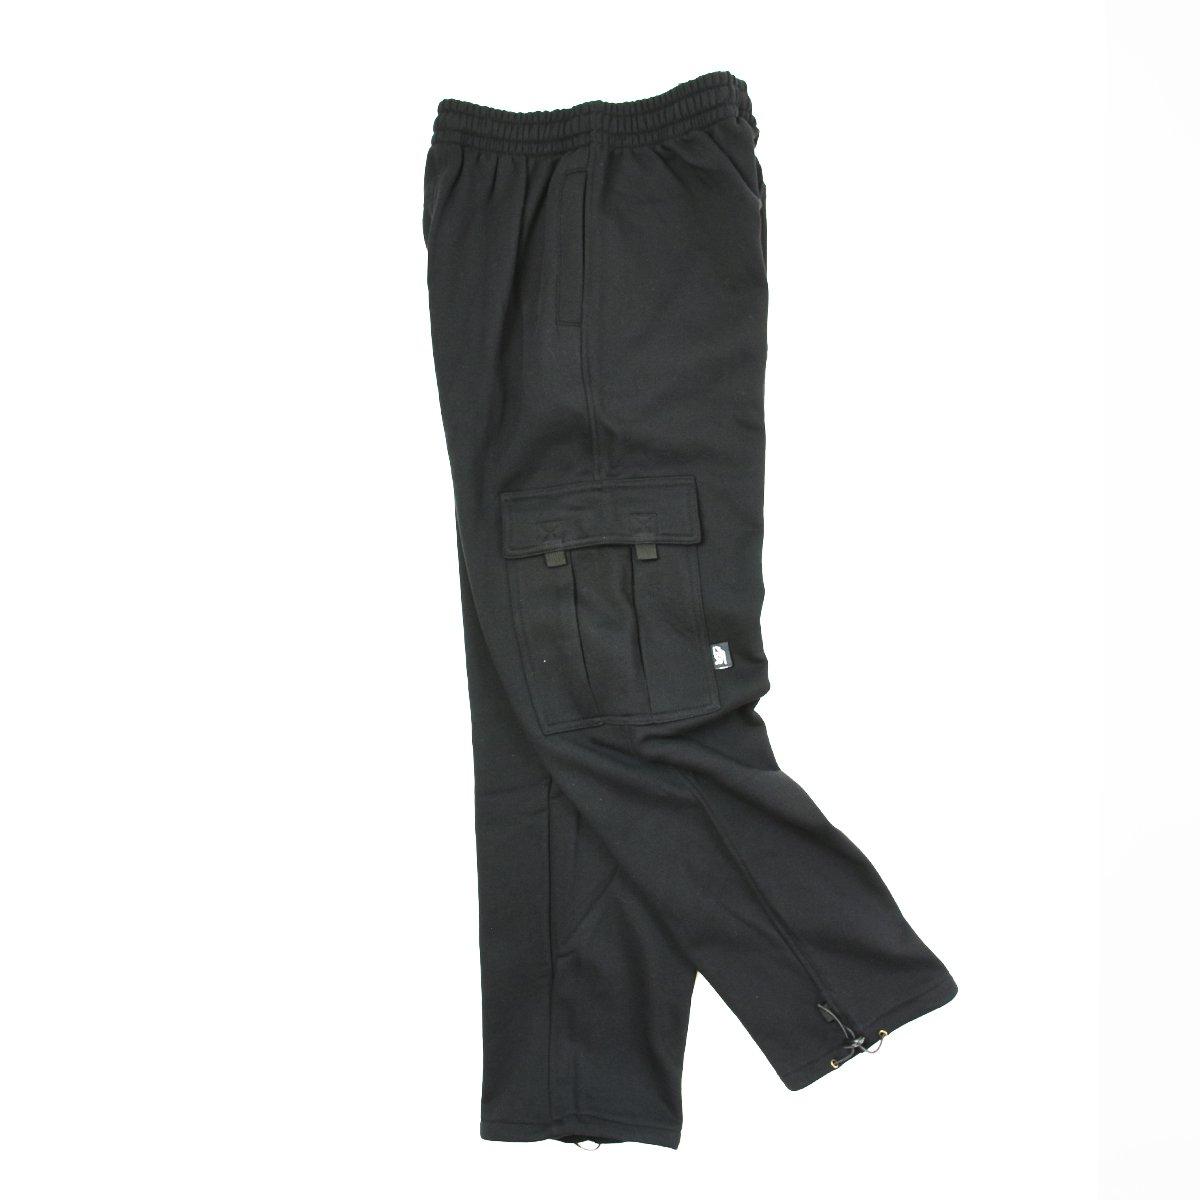 【PRO 5】Heavy Fleece Cargo Pants(Black)                           </a>             <span class=